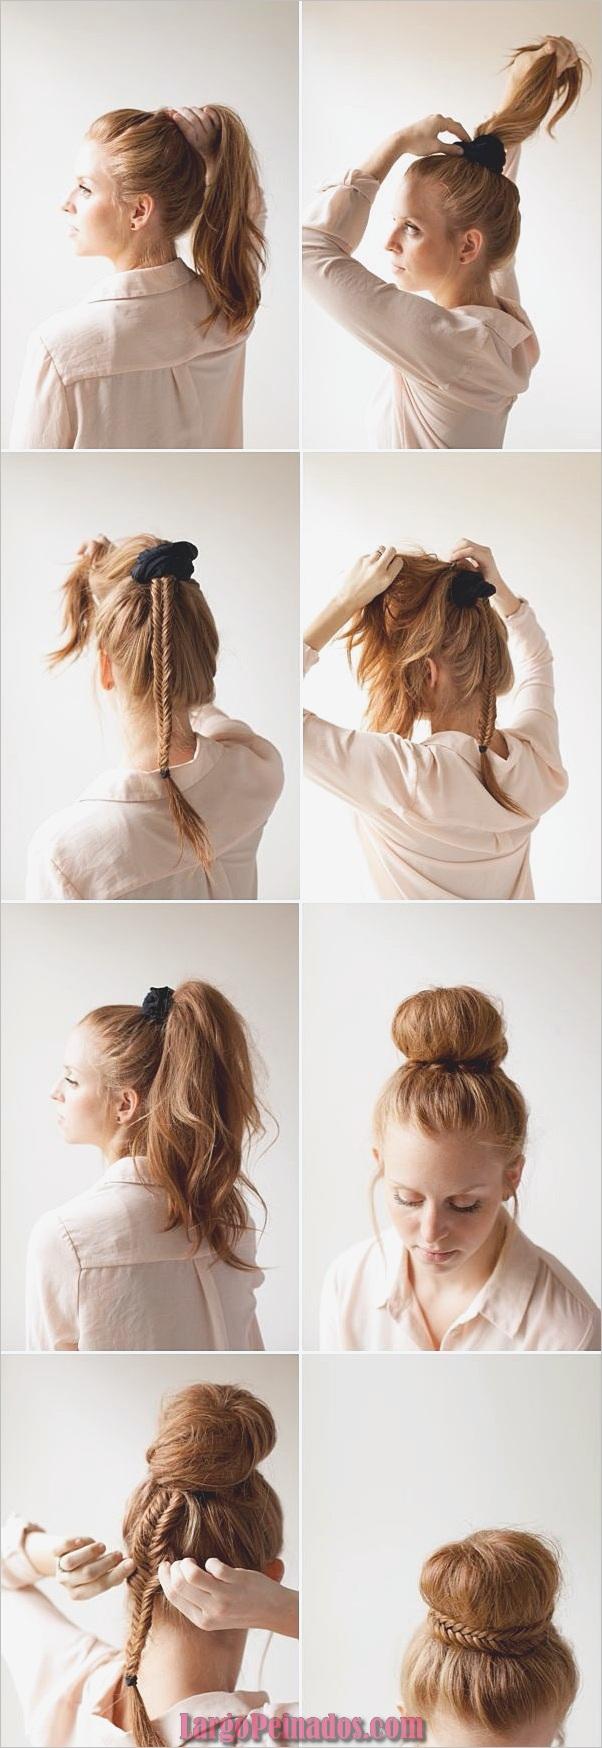 Peinados de Bollo Fácil para Mujeres (5)